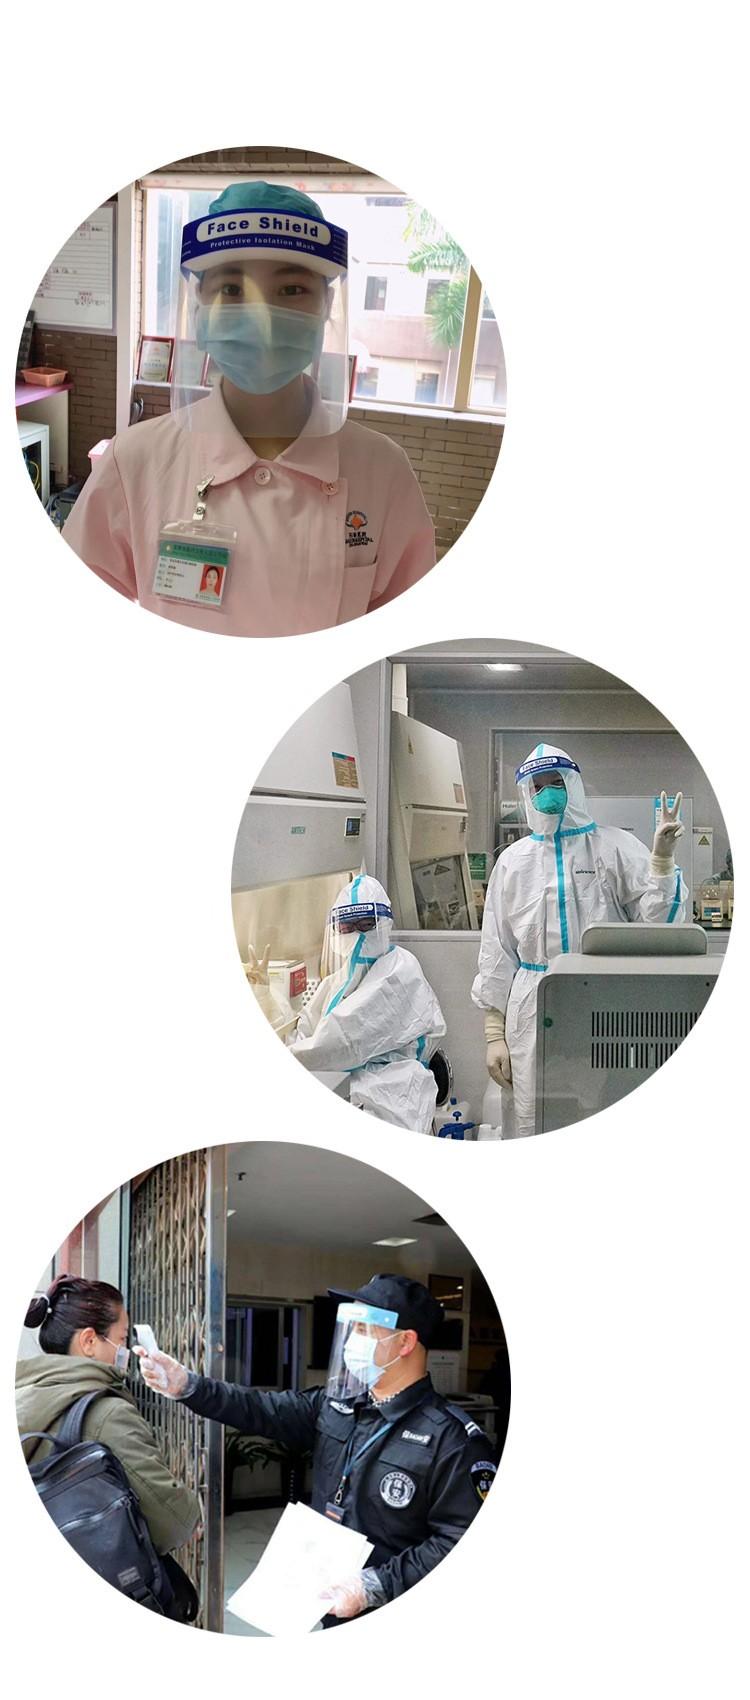 zashhitnaja maska dlja lica plastikovaja medicinskaja mnogorazovaja 04 - Индивидуальный защитный комплект врача-инфекциониста: защитный костюм+ маска KN95 + защитный экран для лица